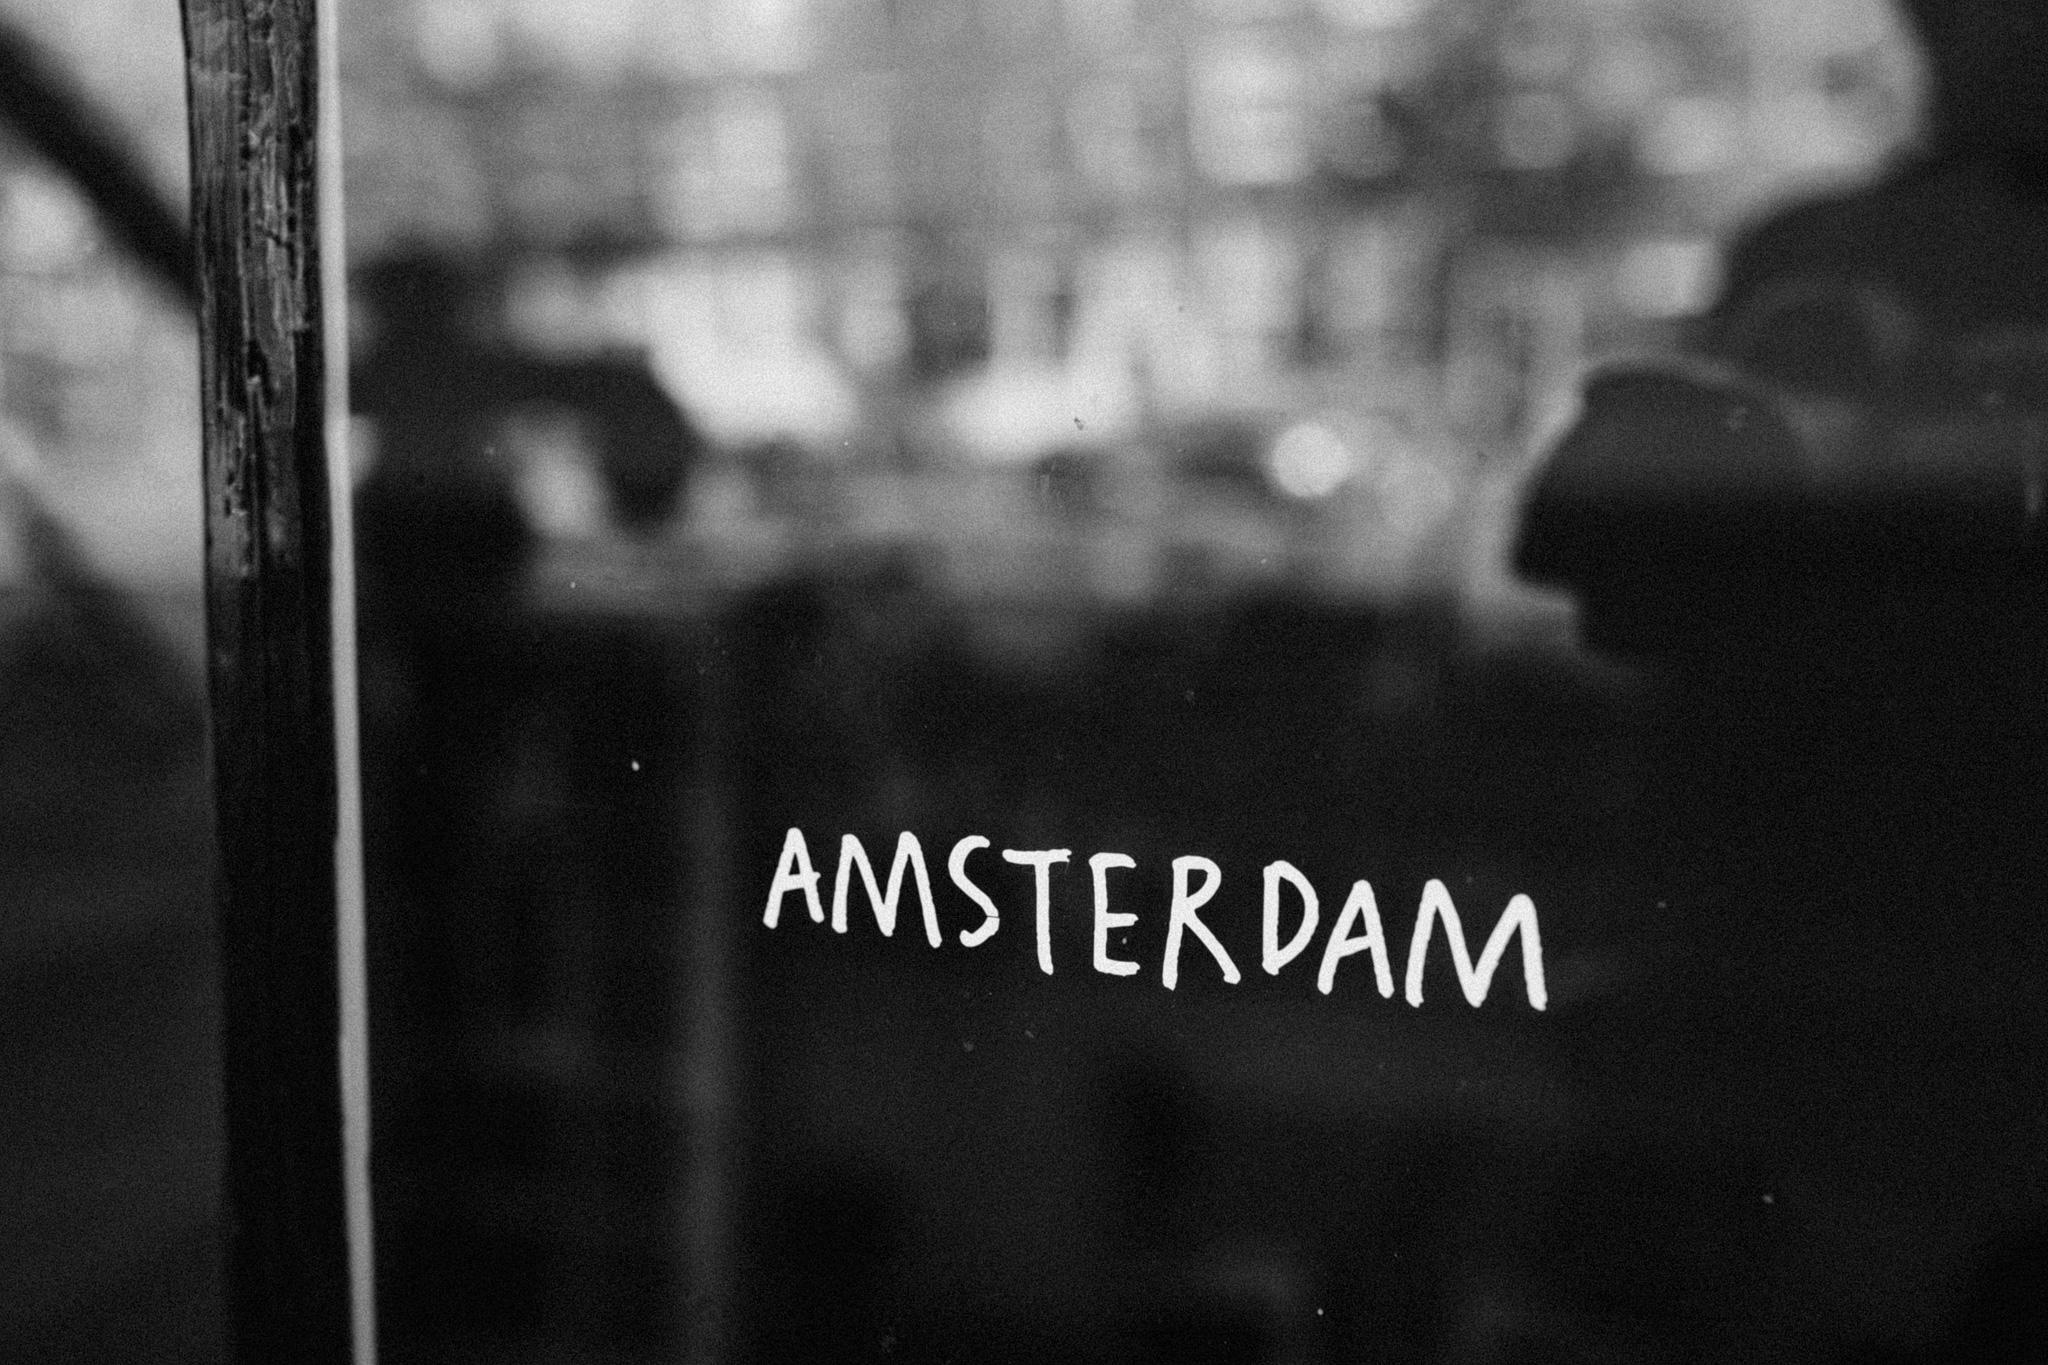 Amsterdam sign written on window